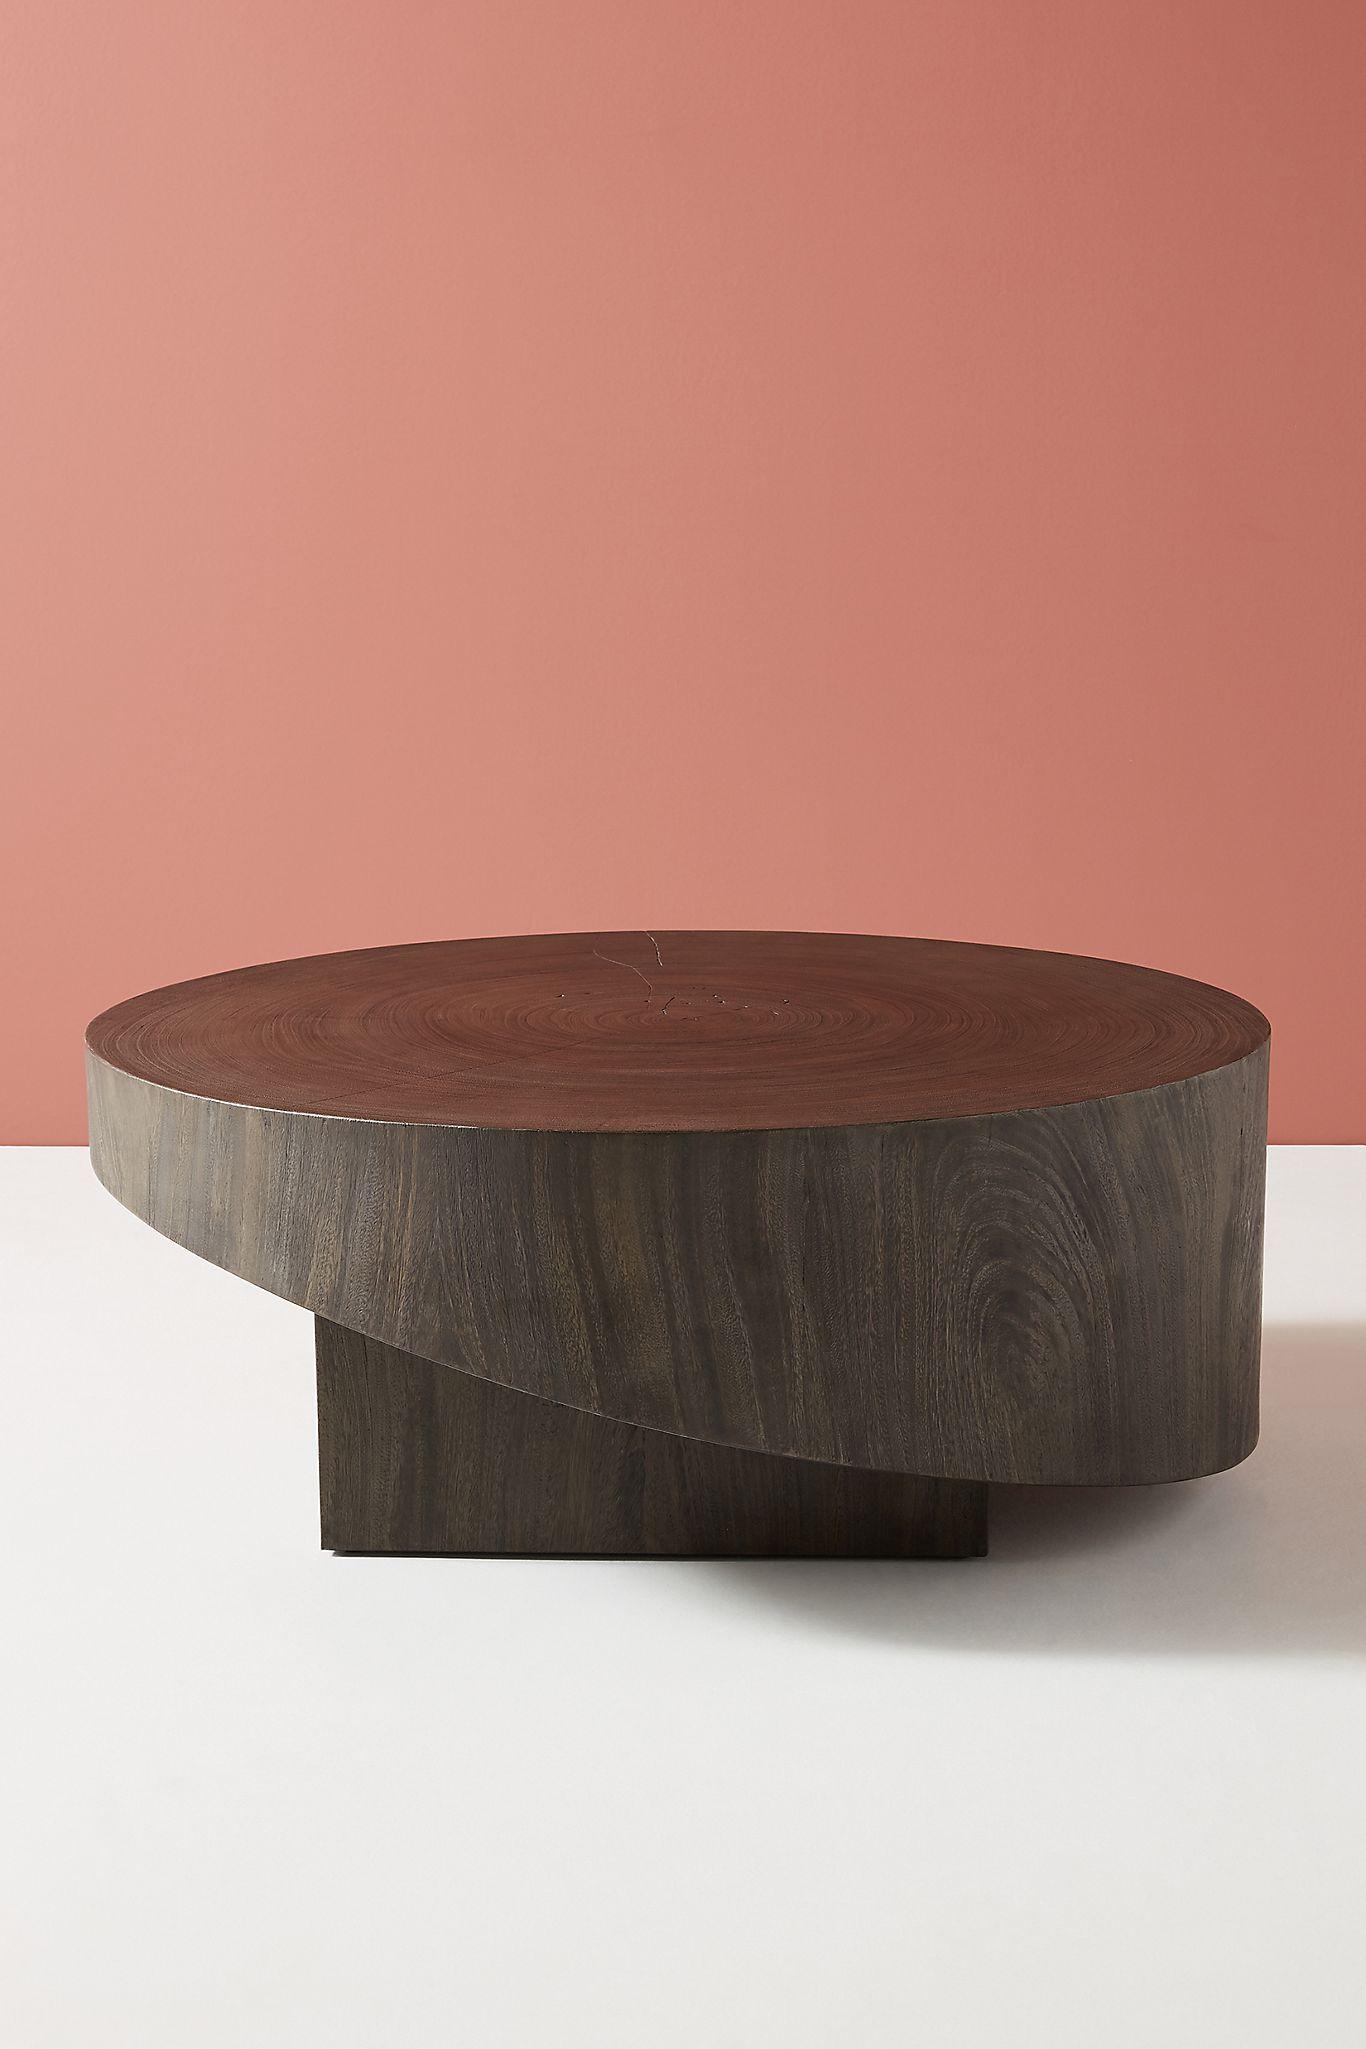 Cuna Reclaimed Wood Coffee Table In 2021 Coffee Table Wood Reclaimed Wood Coffee Table Coffee Table [ 2049 x 1366 Pixel ]